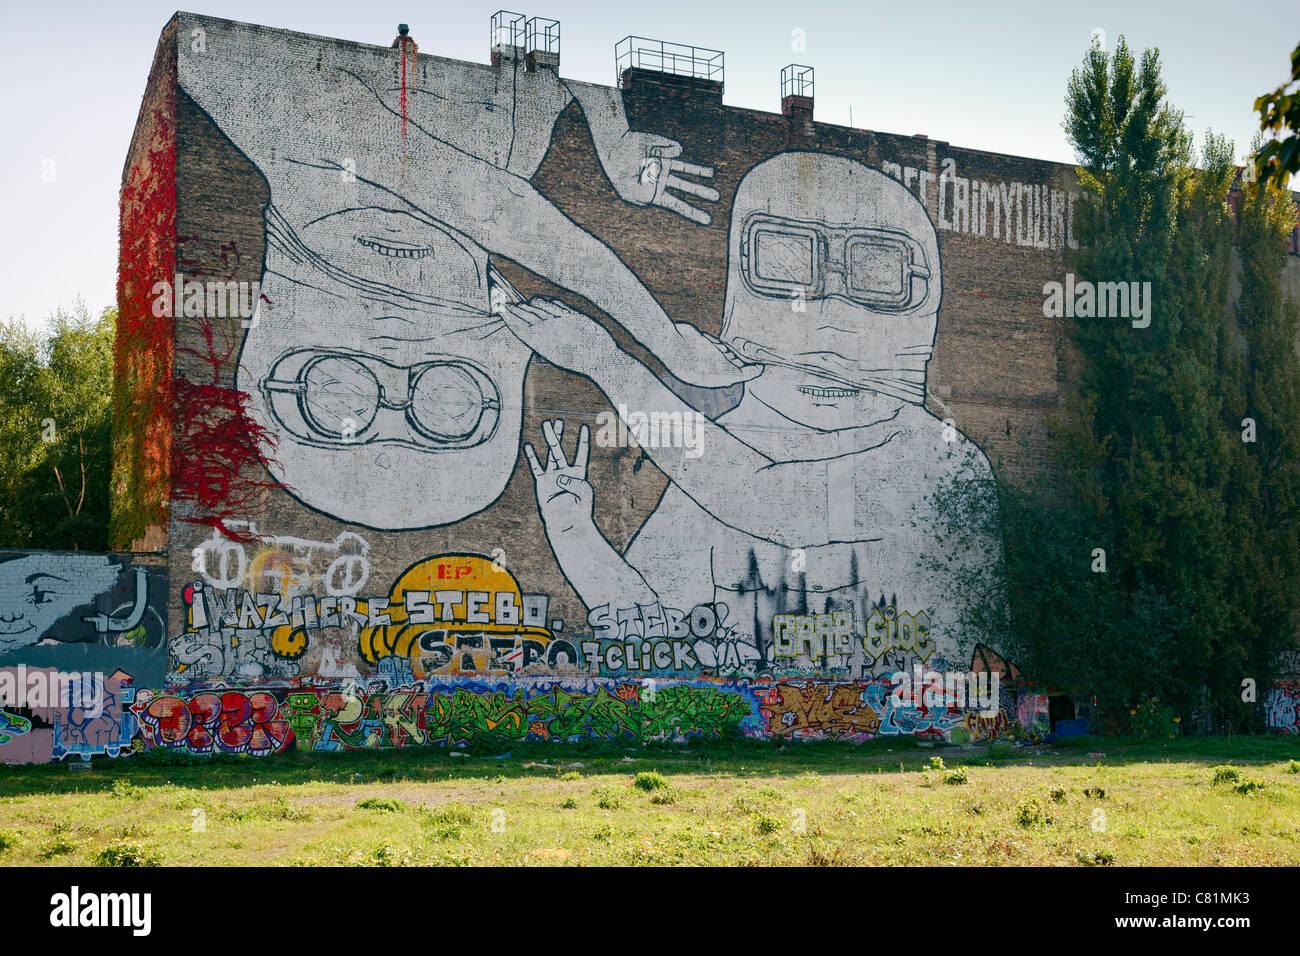 Graffiti del blu in Cuvrystrasse, Berlino, Germania Immagini Stock